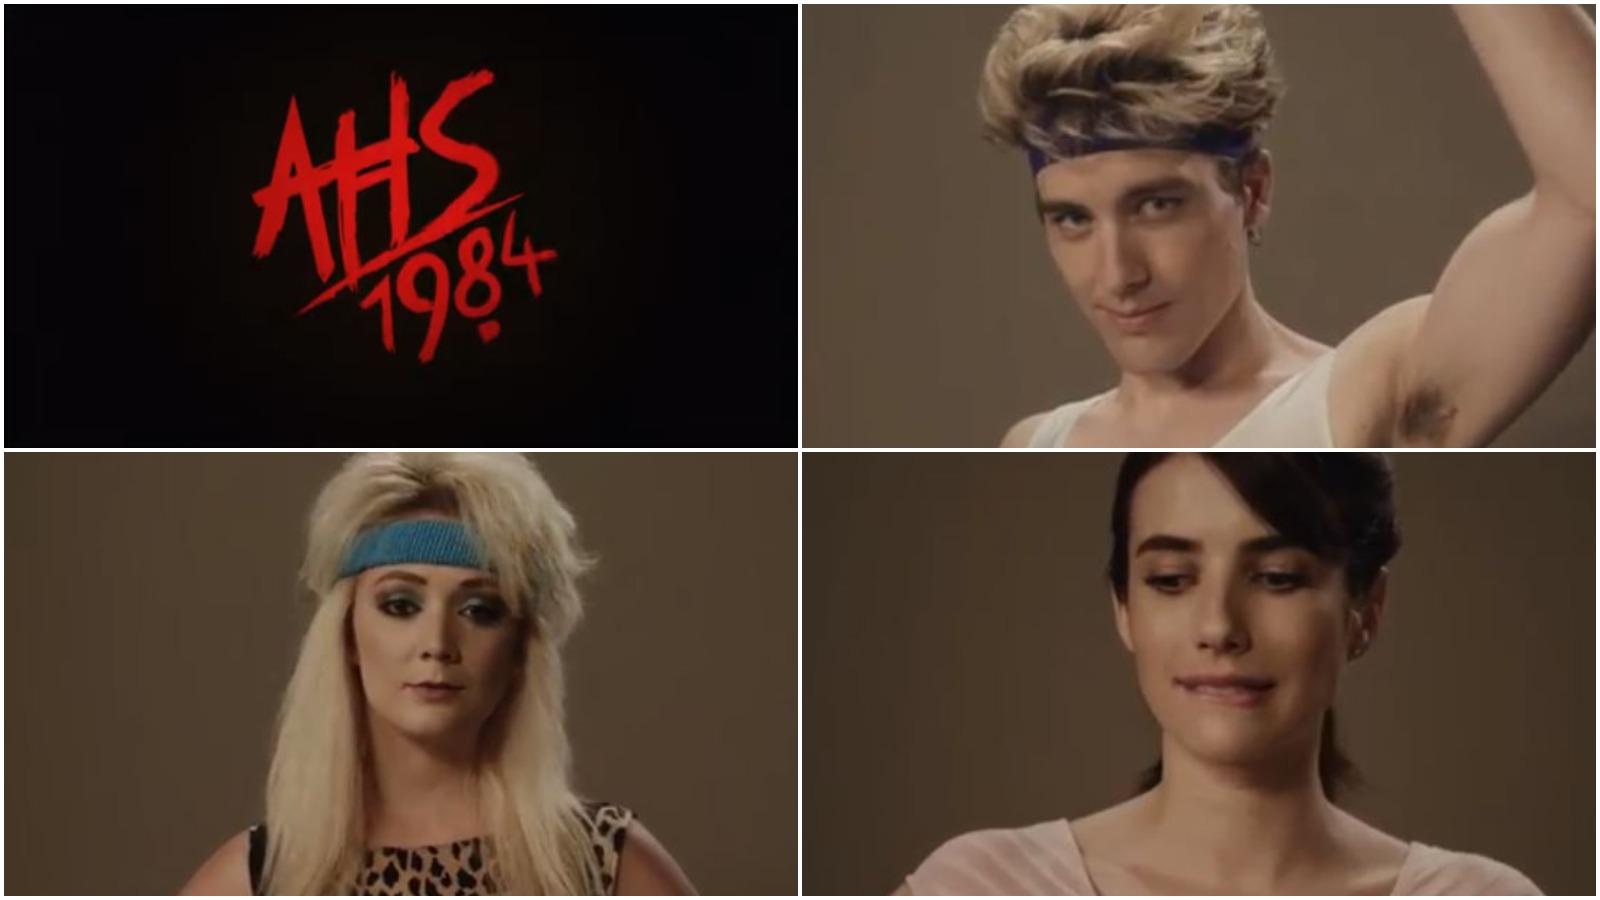 Risultati immagini per ahs 1984 cast